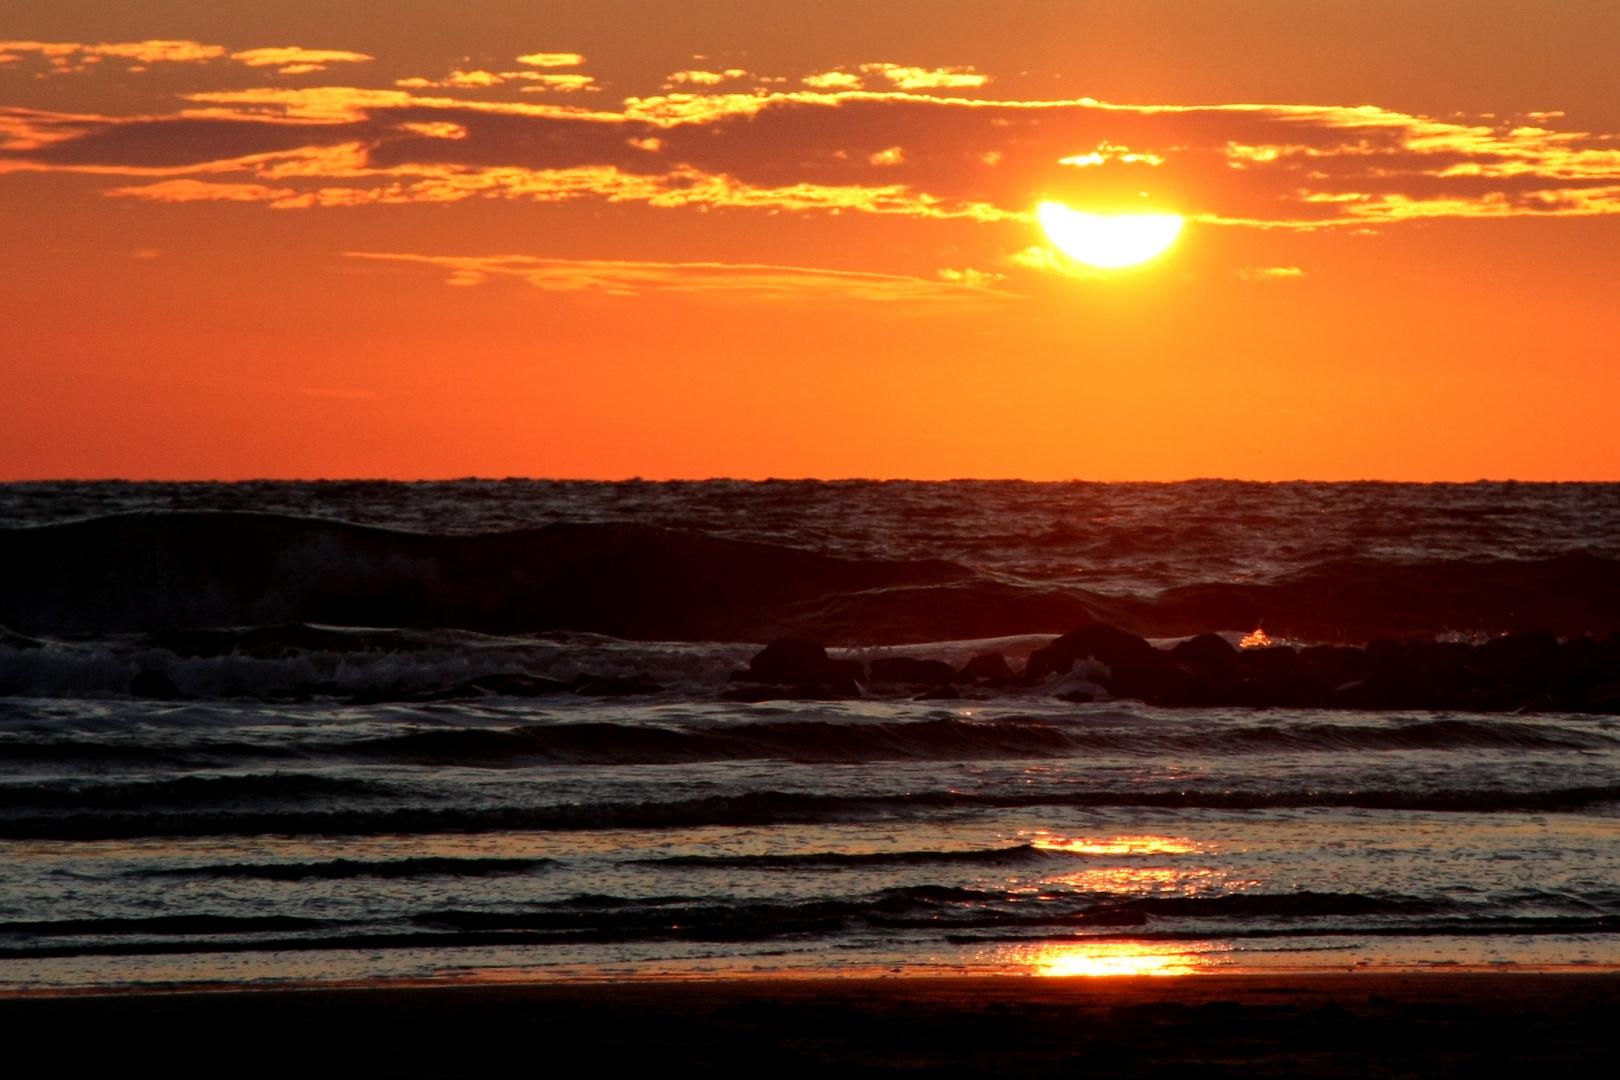 *Sonnenuntergang am Strand*